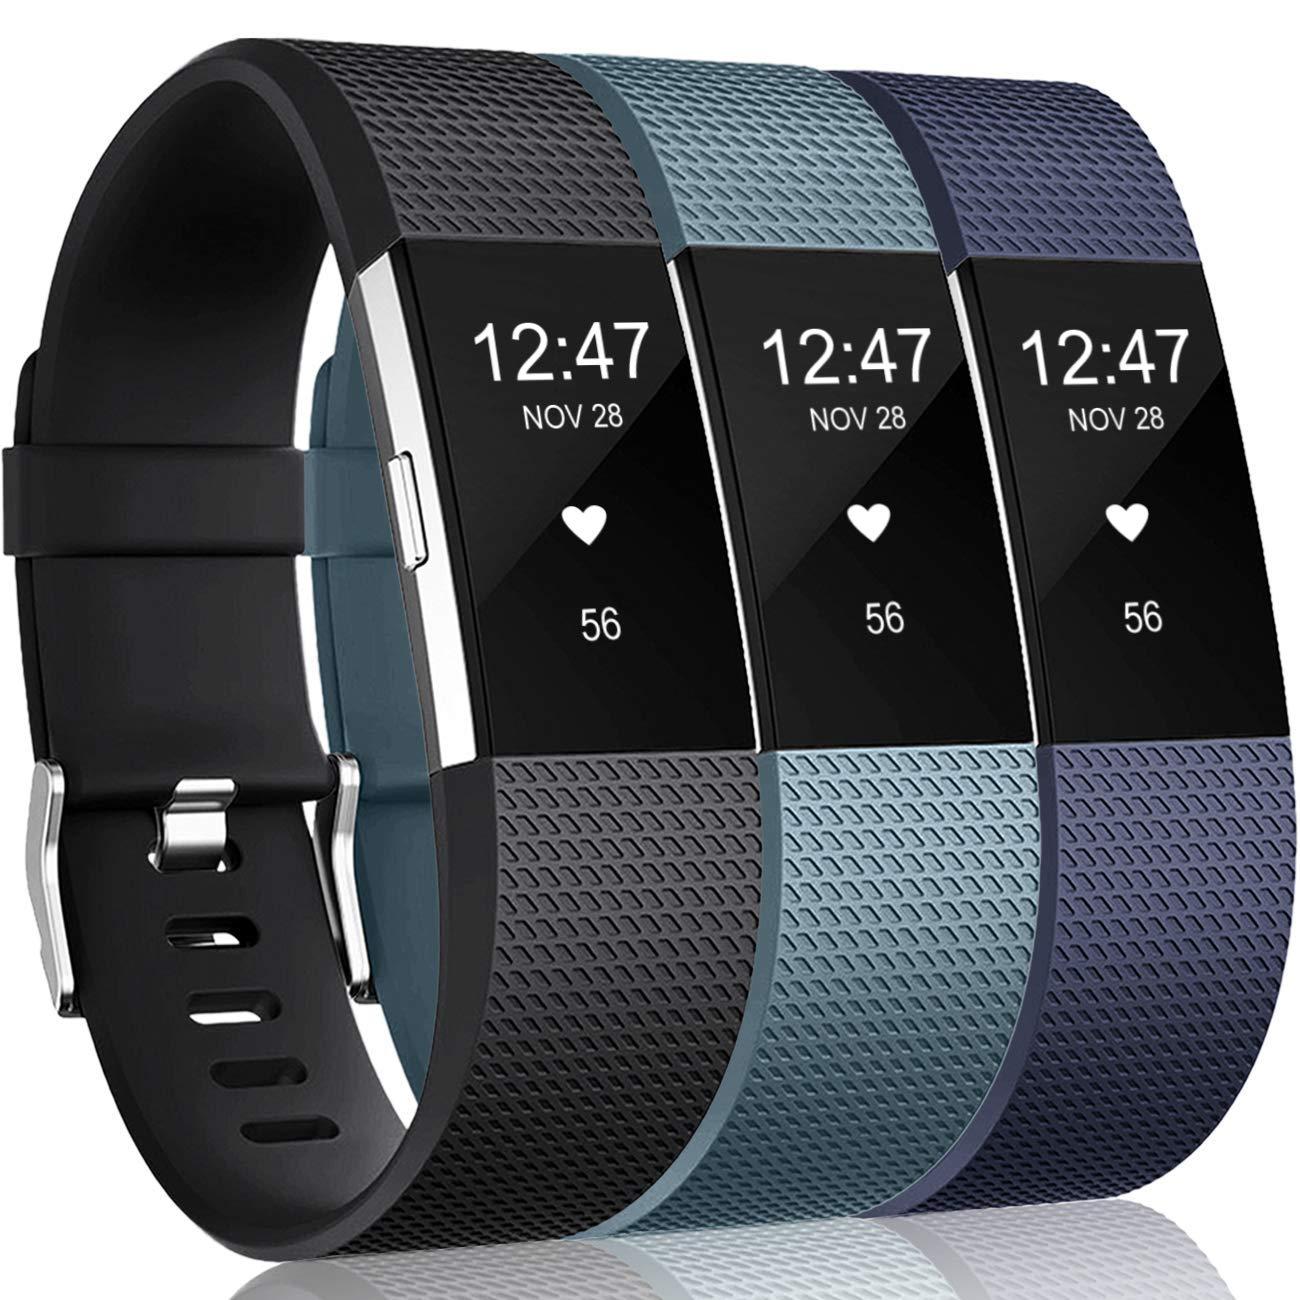 3 Mallas Small para Fitbit Charge 2 Azul marino / Azul pizar